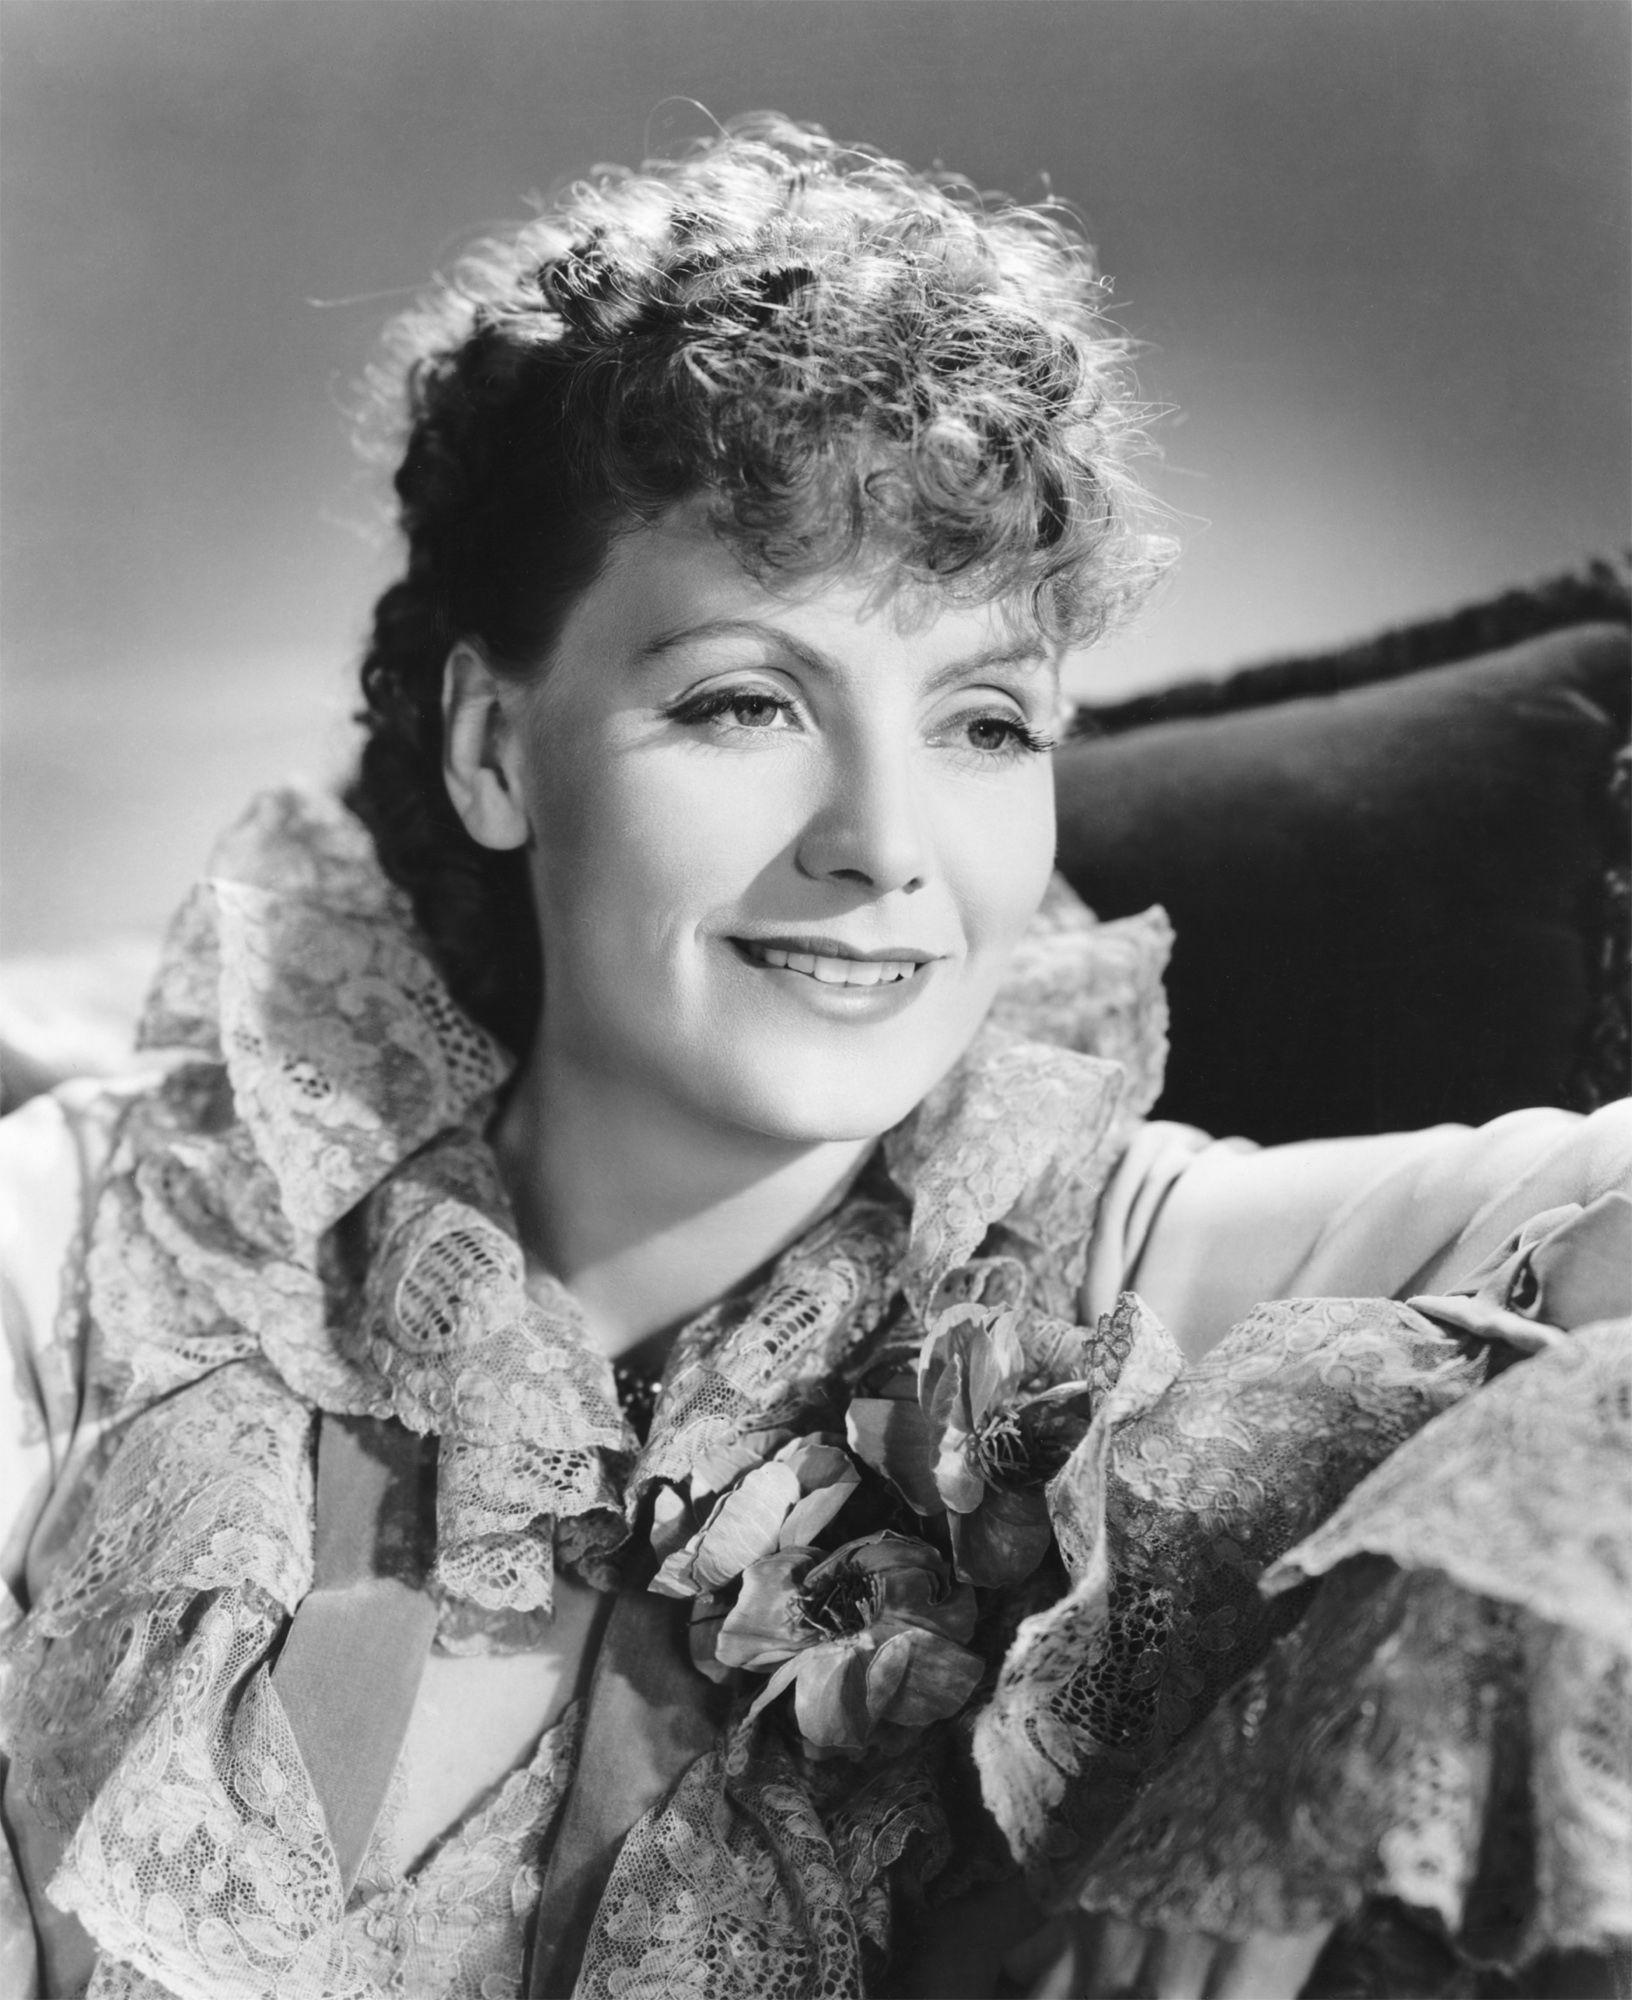 ANNA KARENINA (1935).